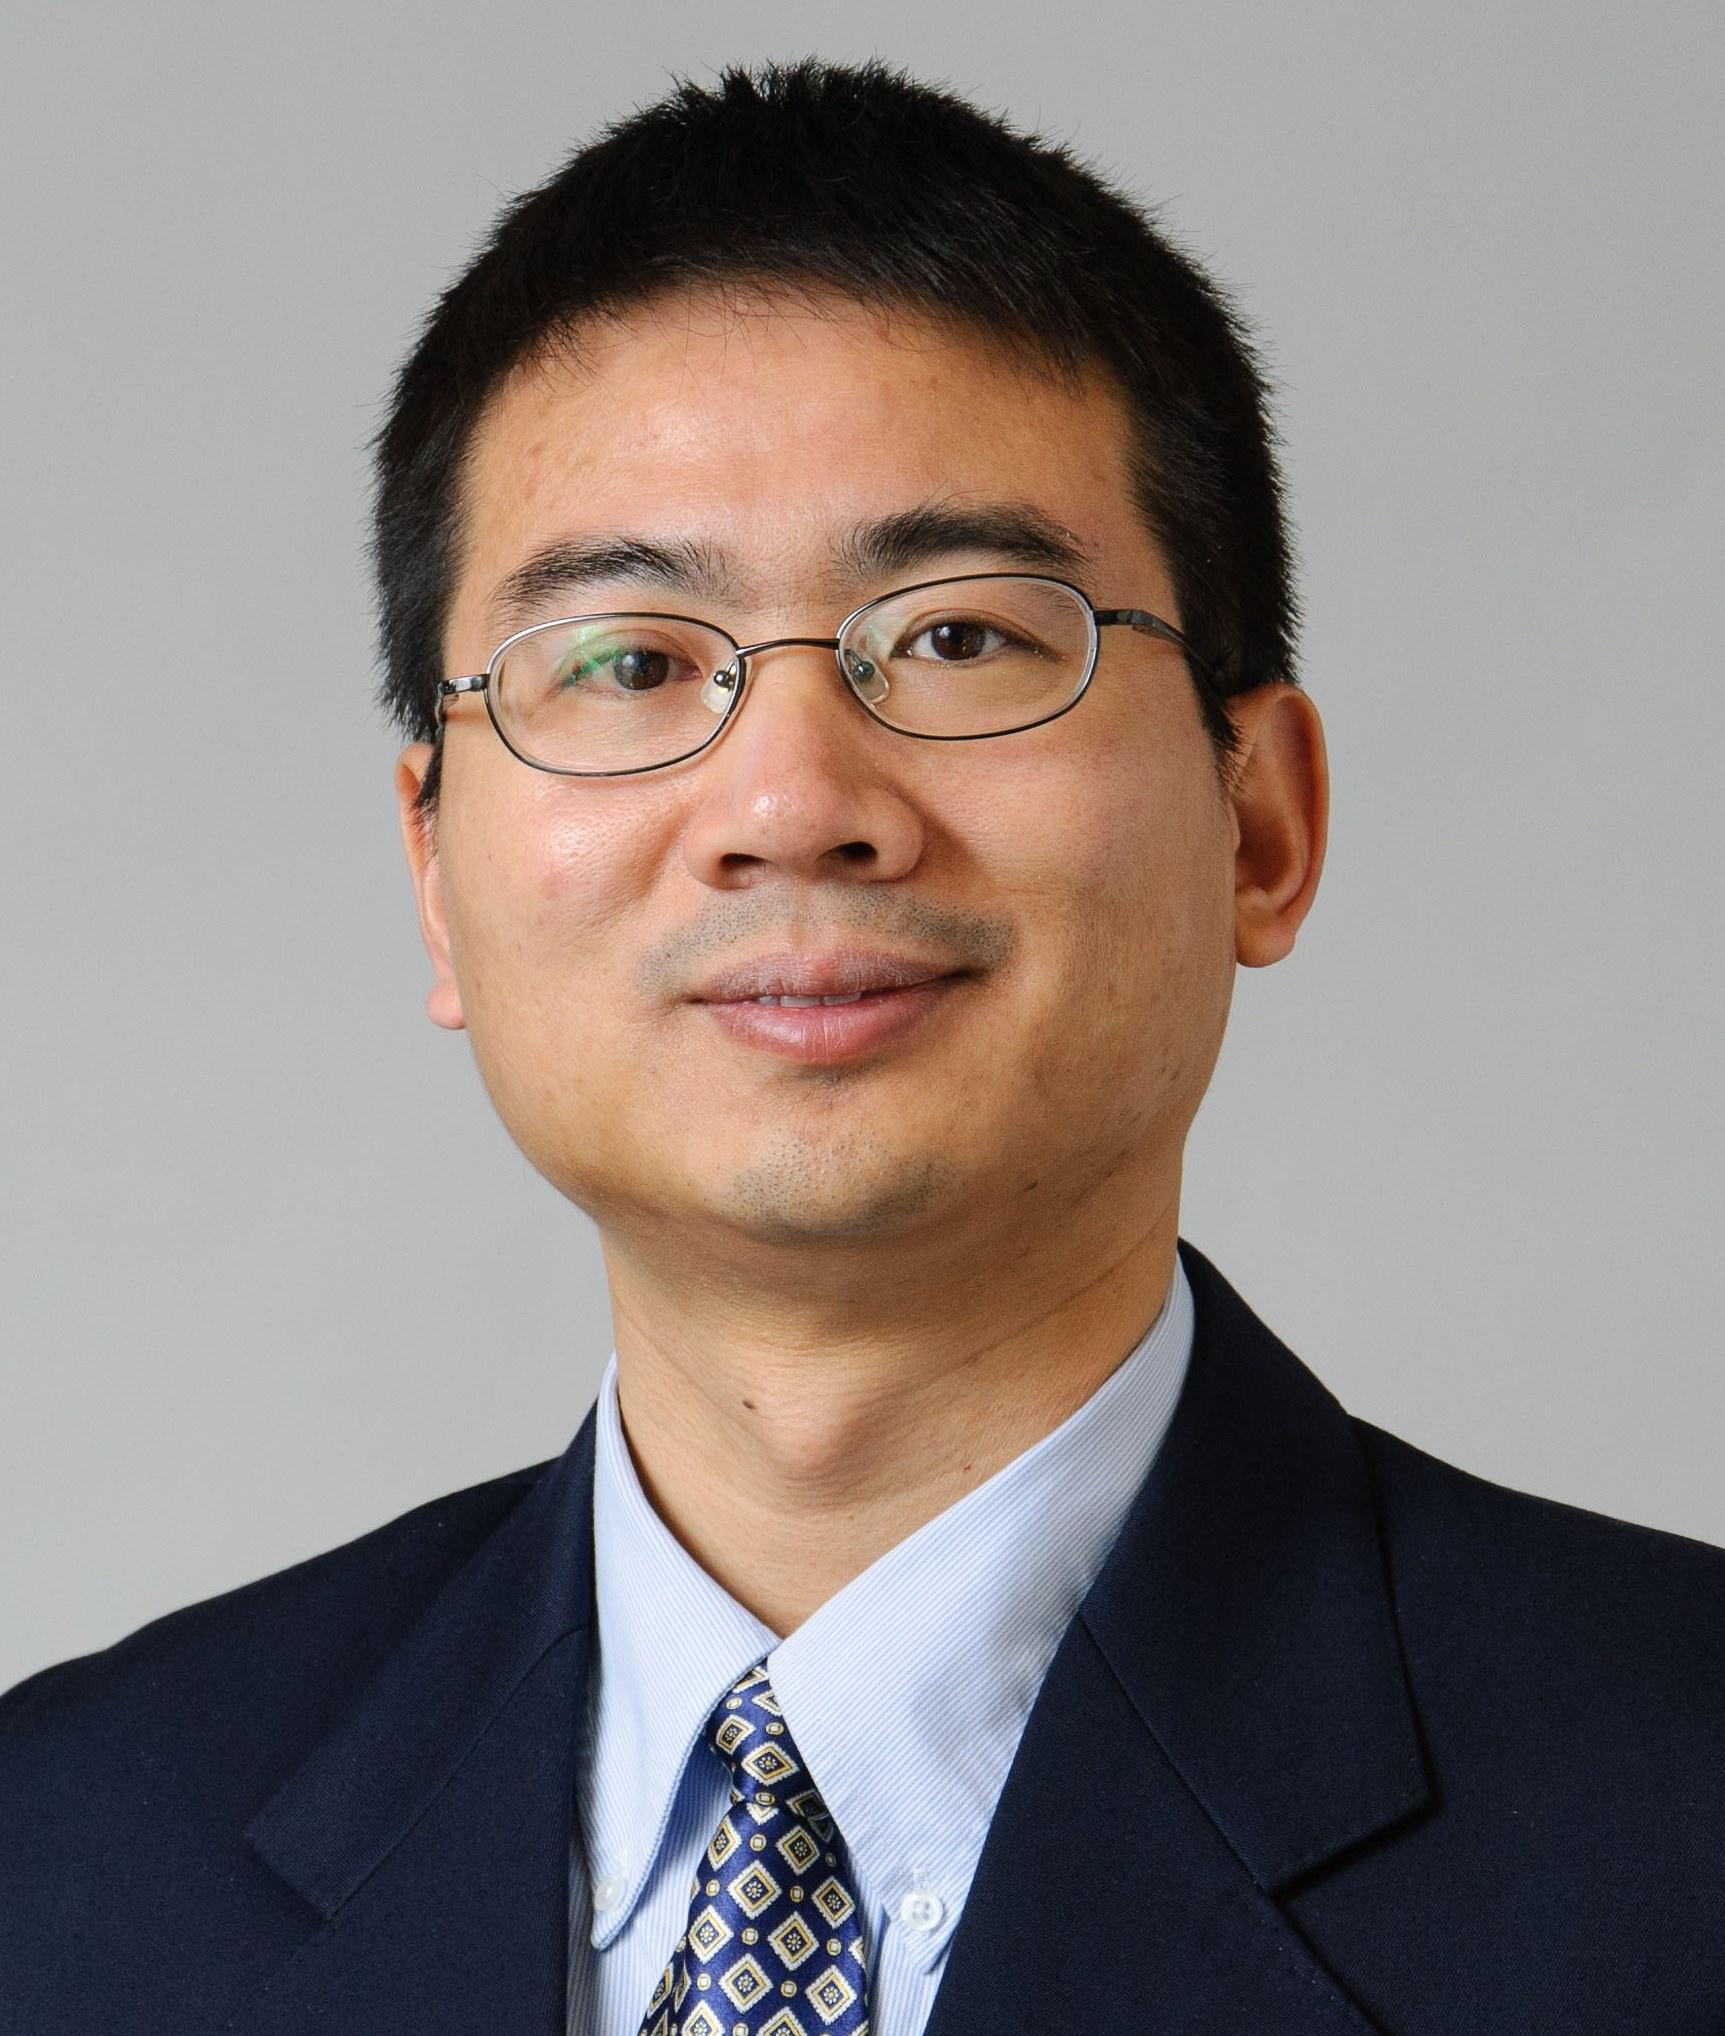 Luyi Sun, Associate Professor Morenus, UConn